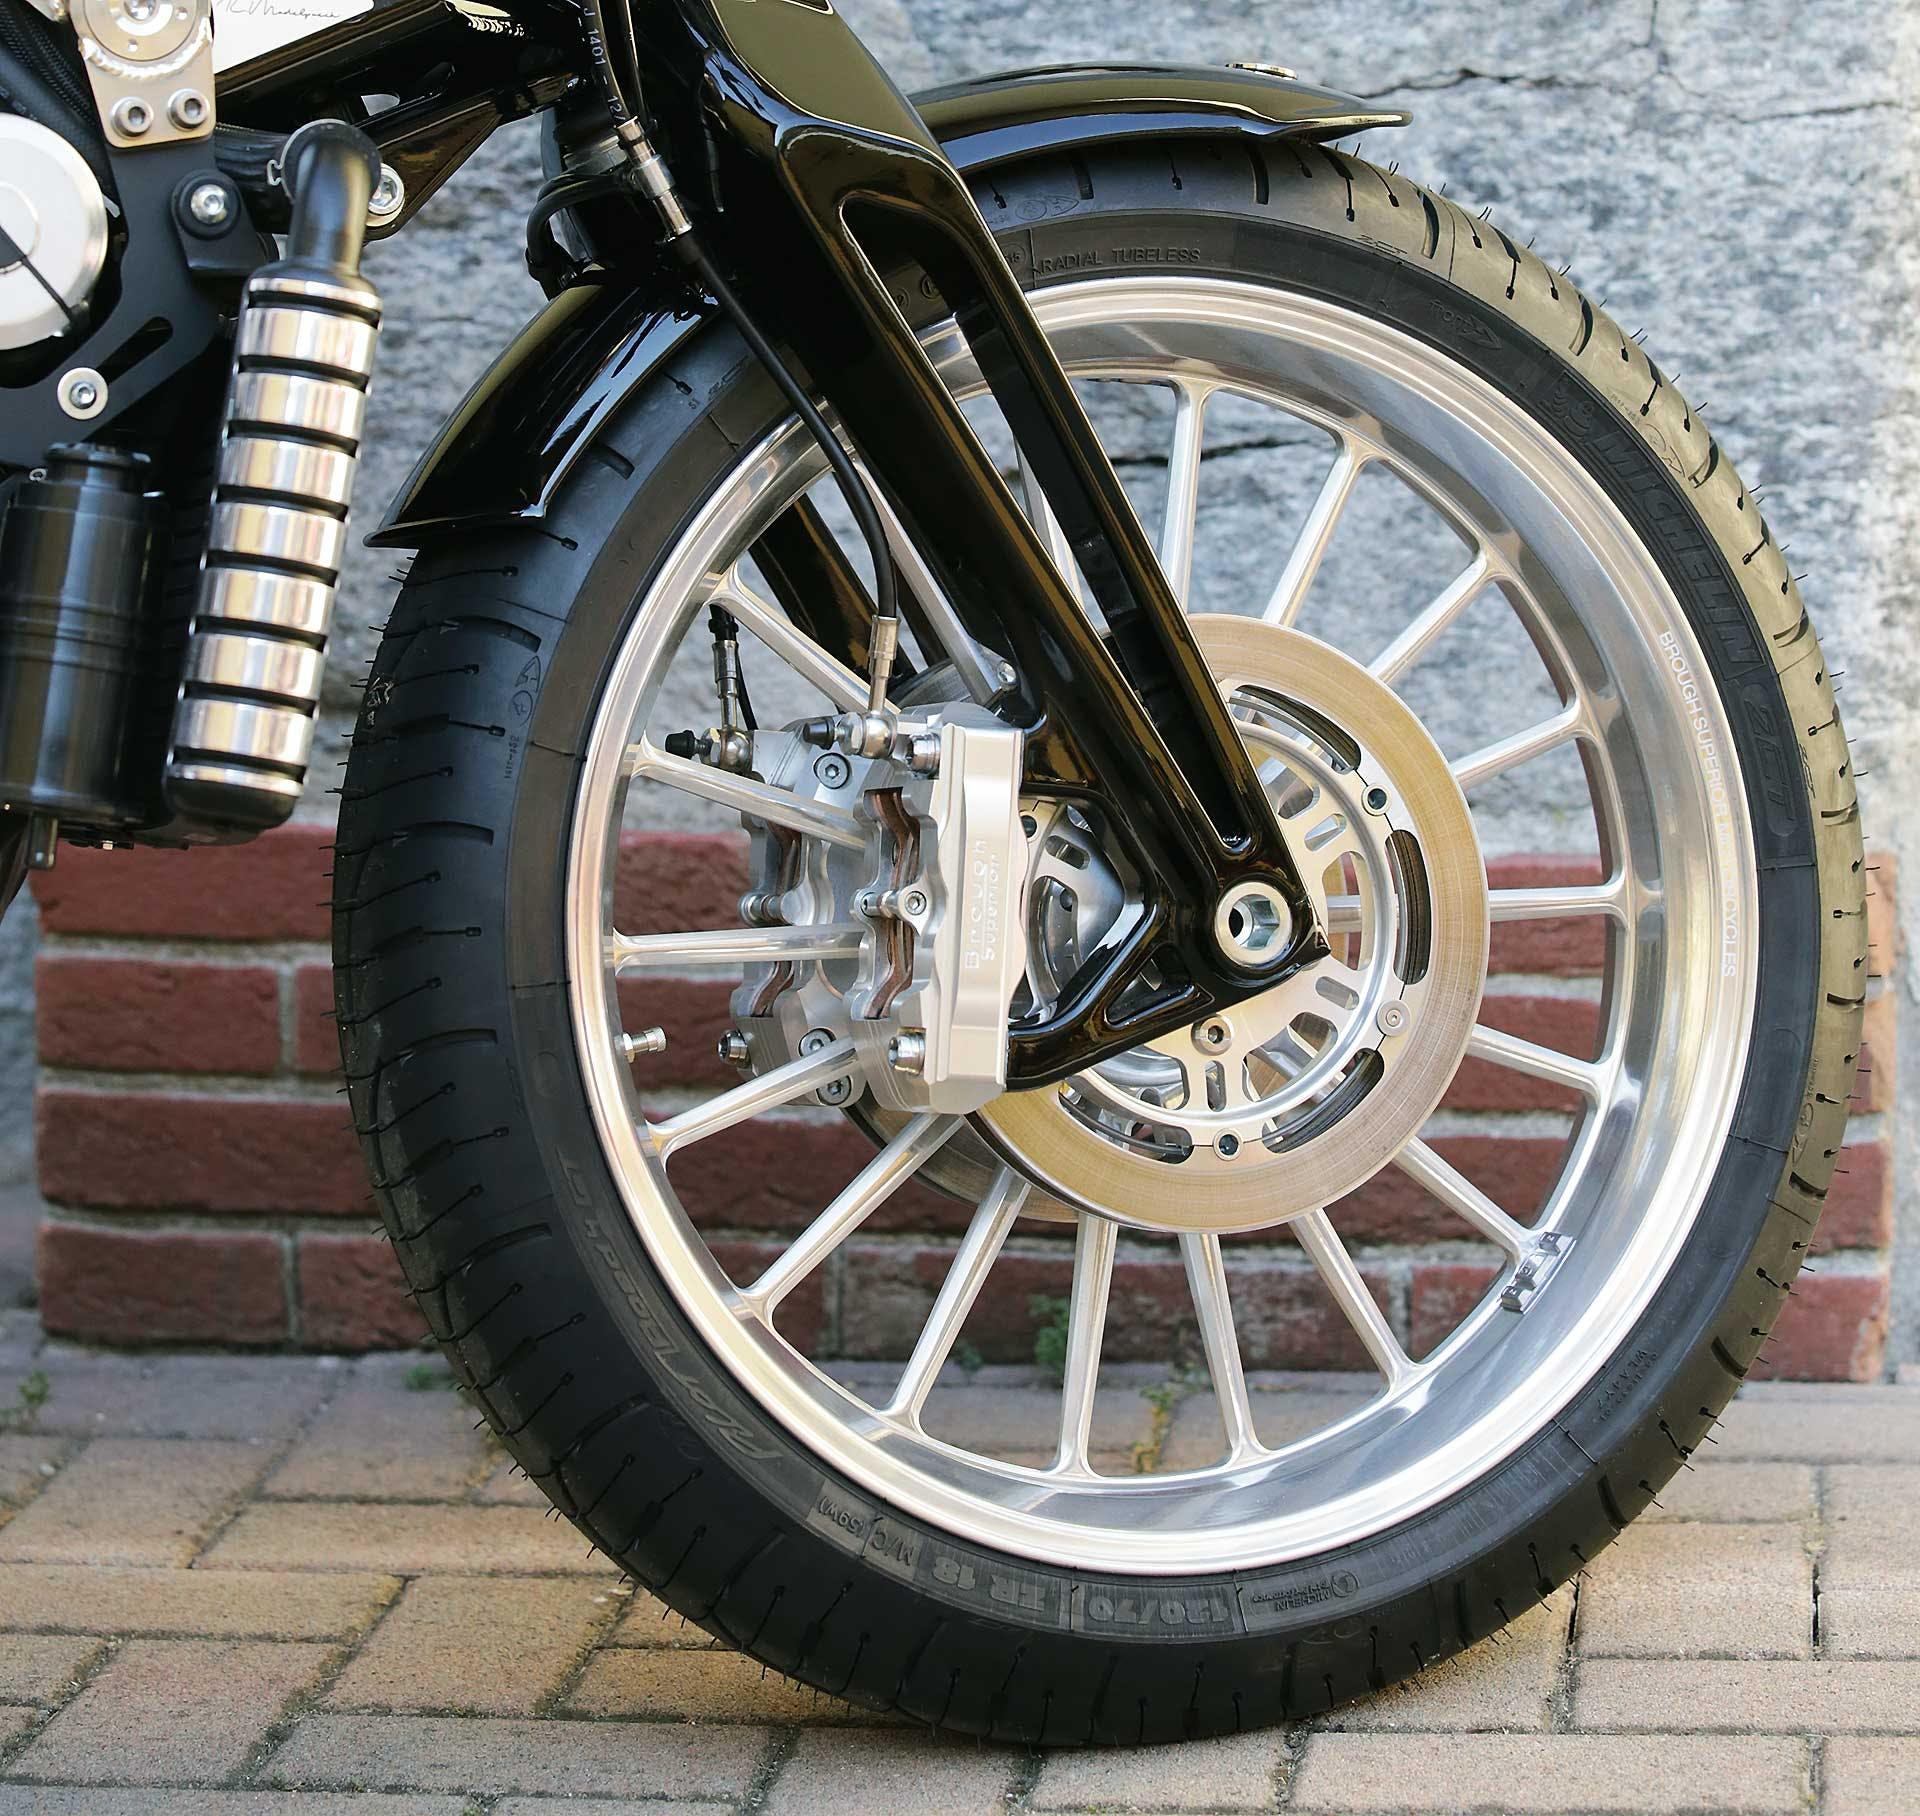 Brough Superior SS1000